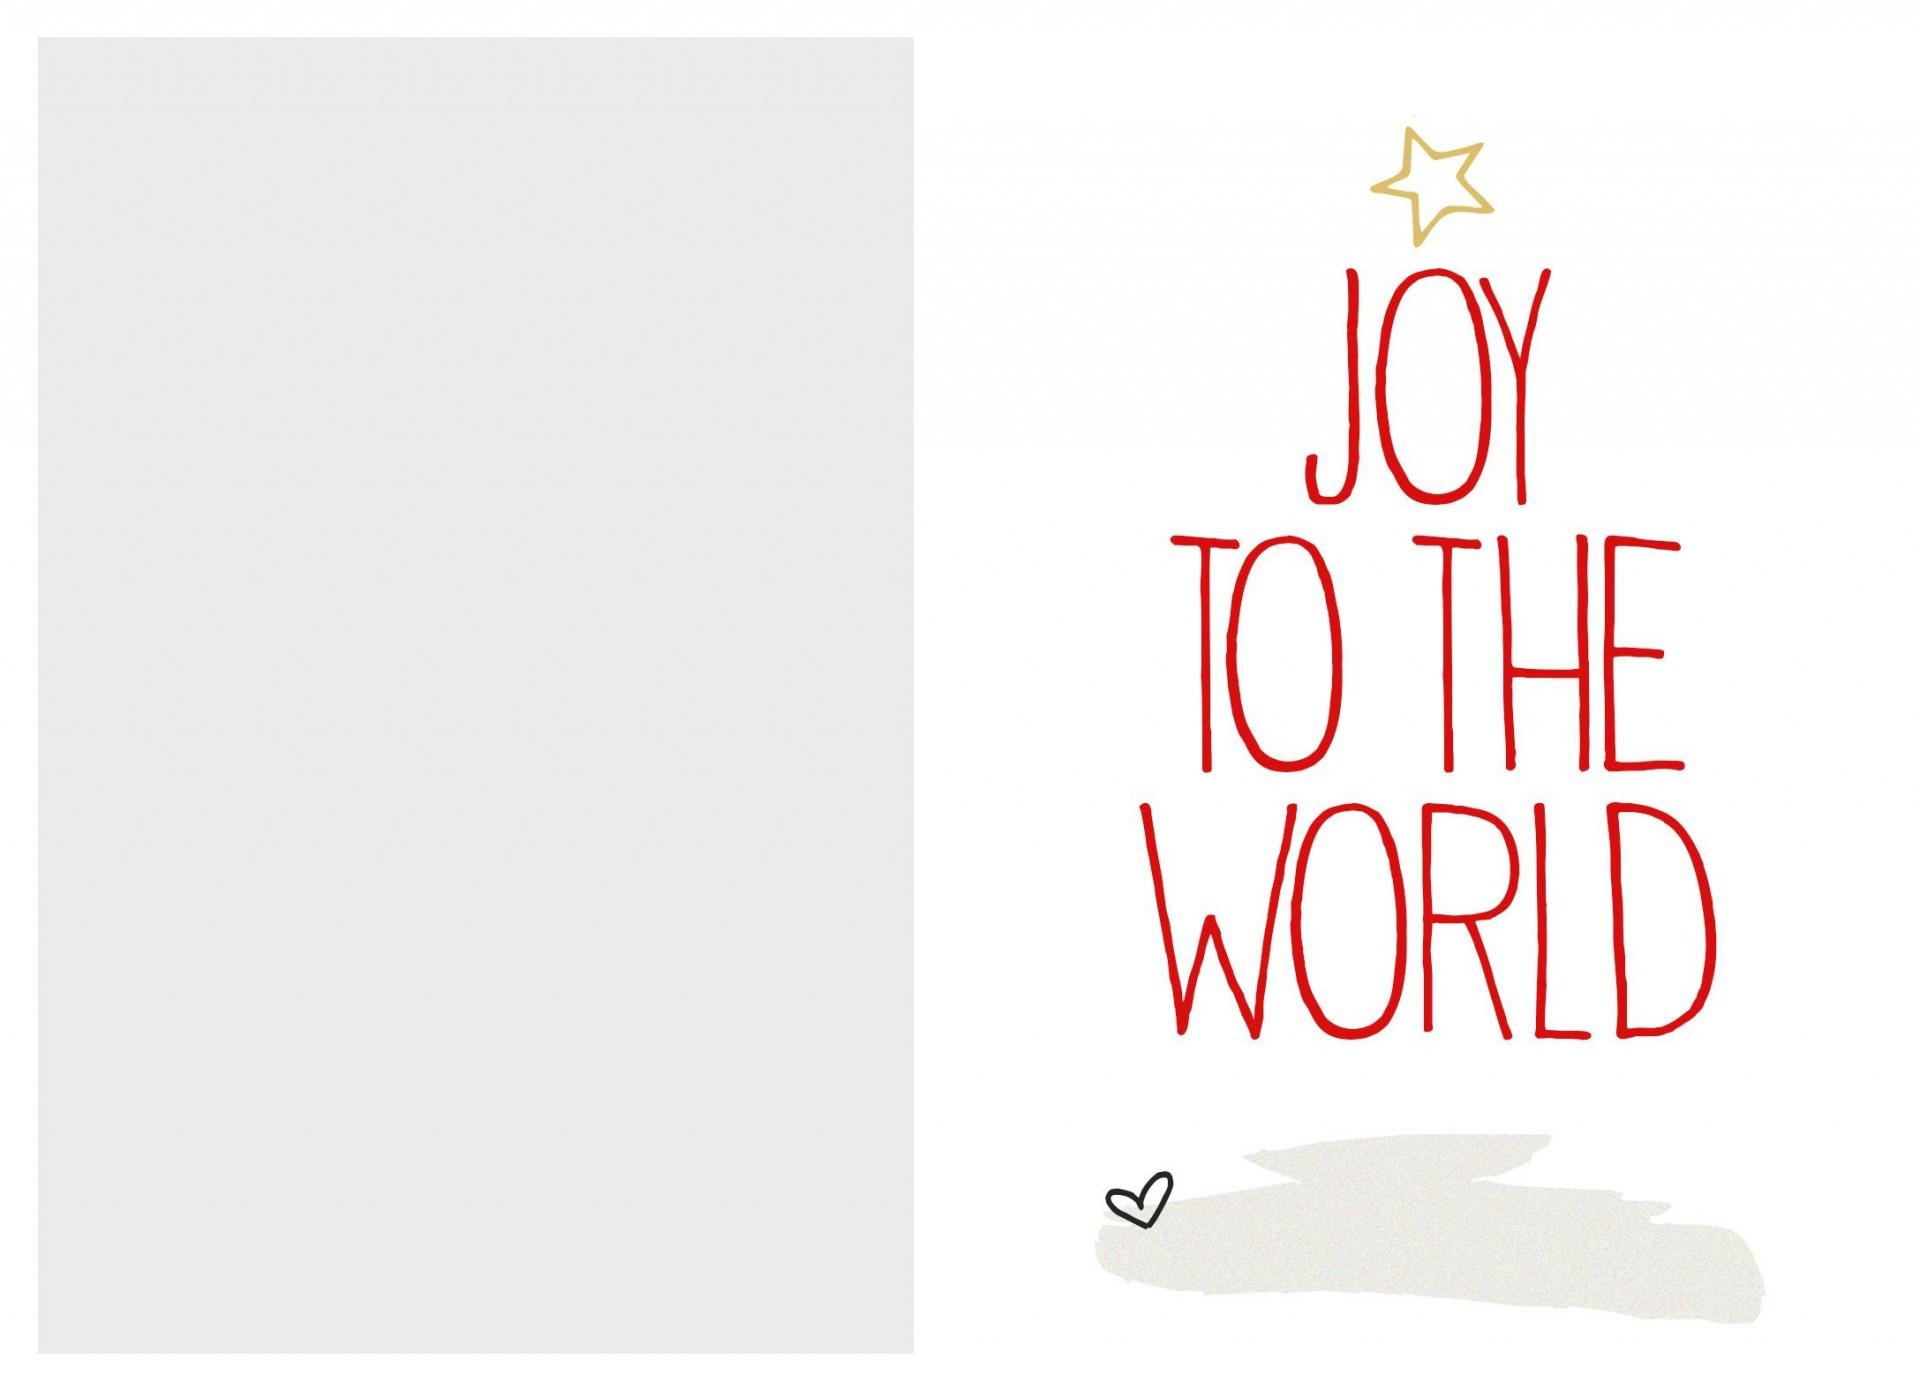 004 Wonderful Free Printable Religiou Christma Card Template Example  Templates1920